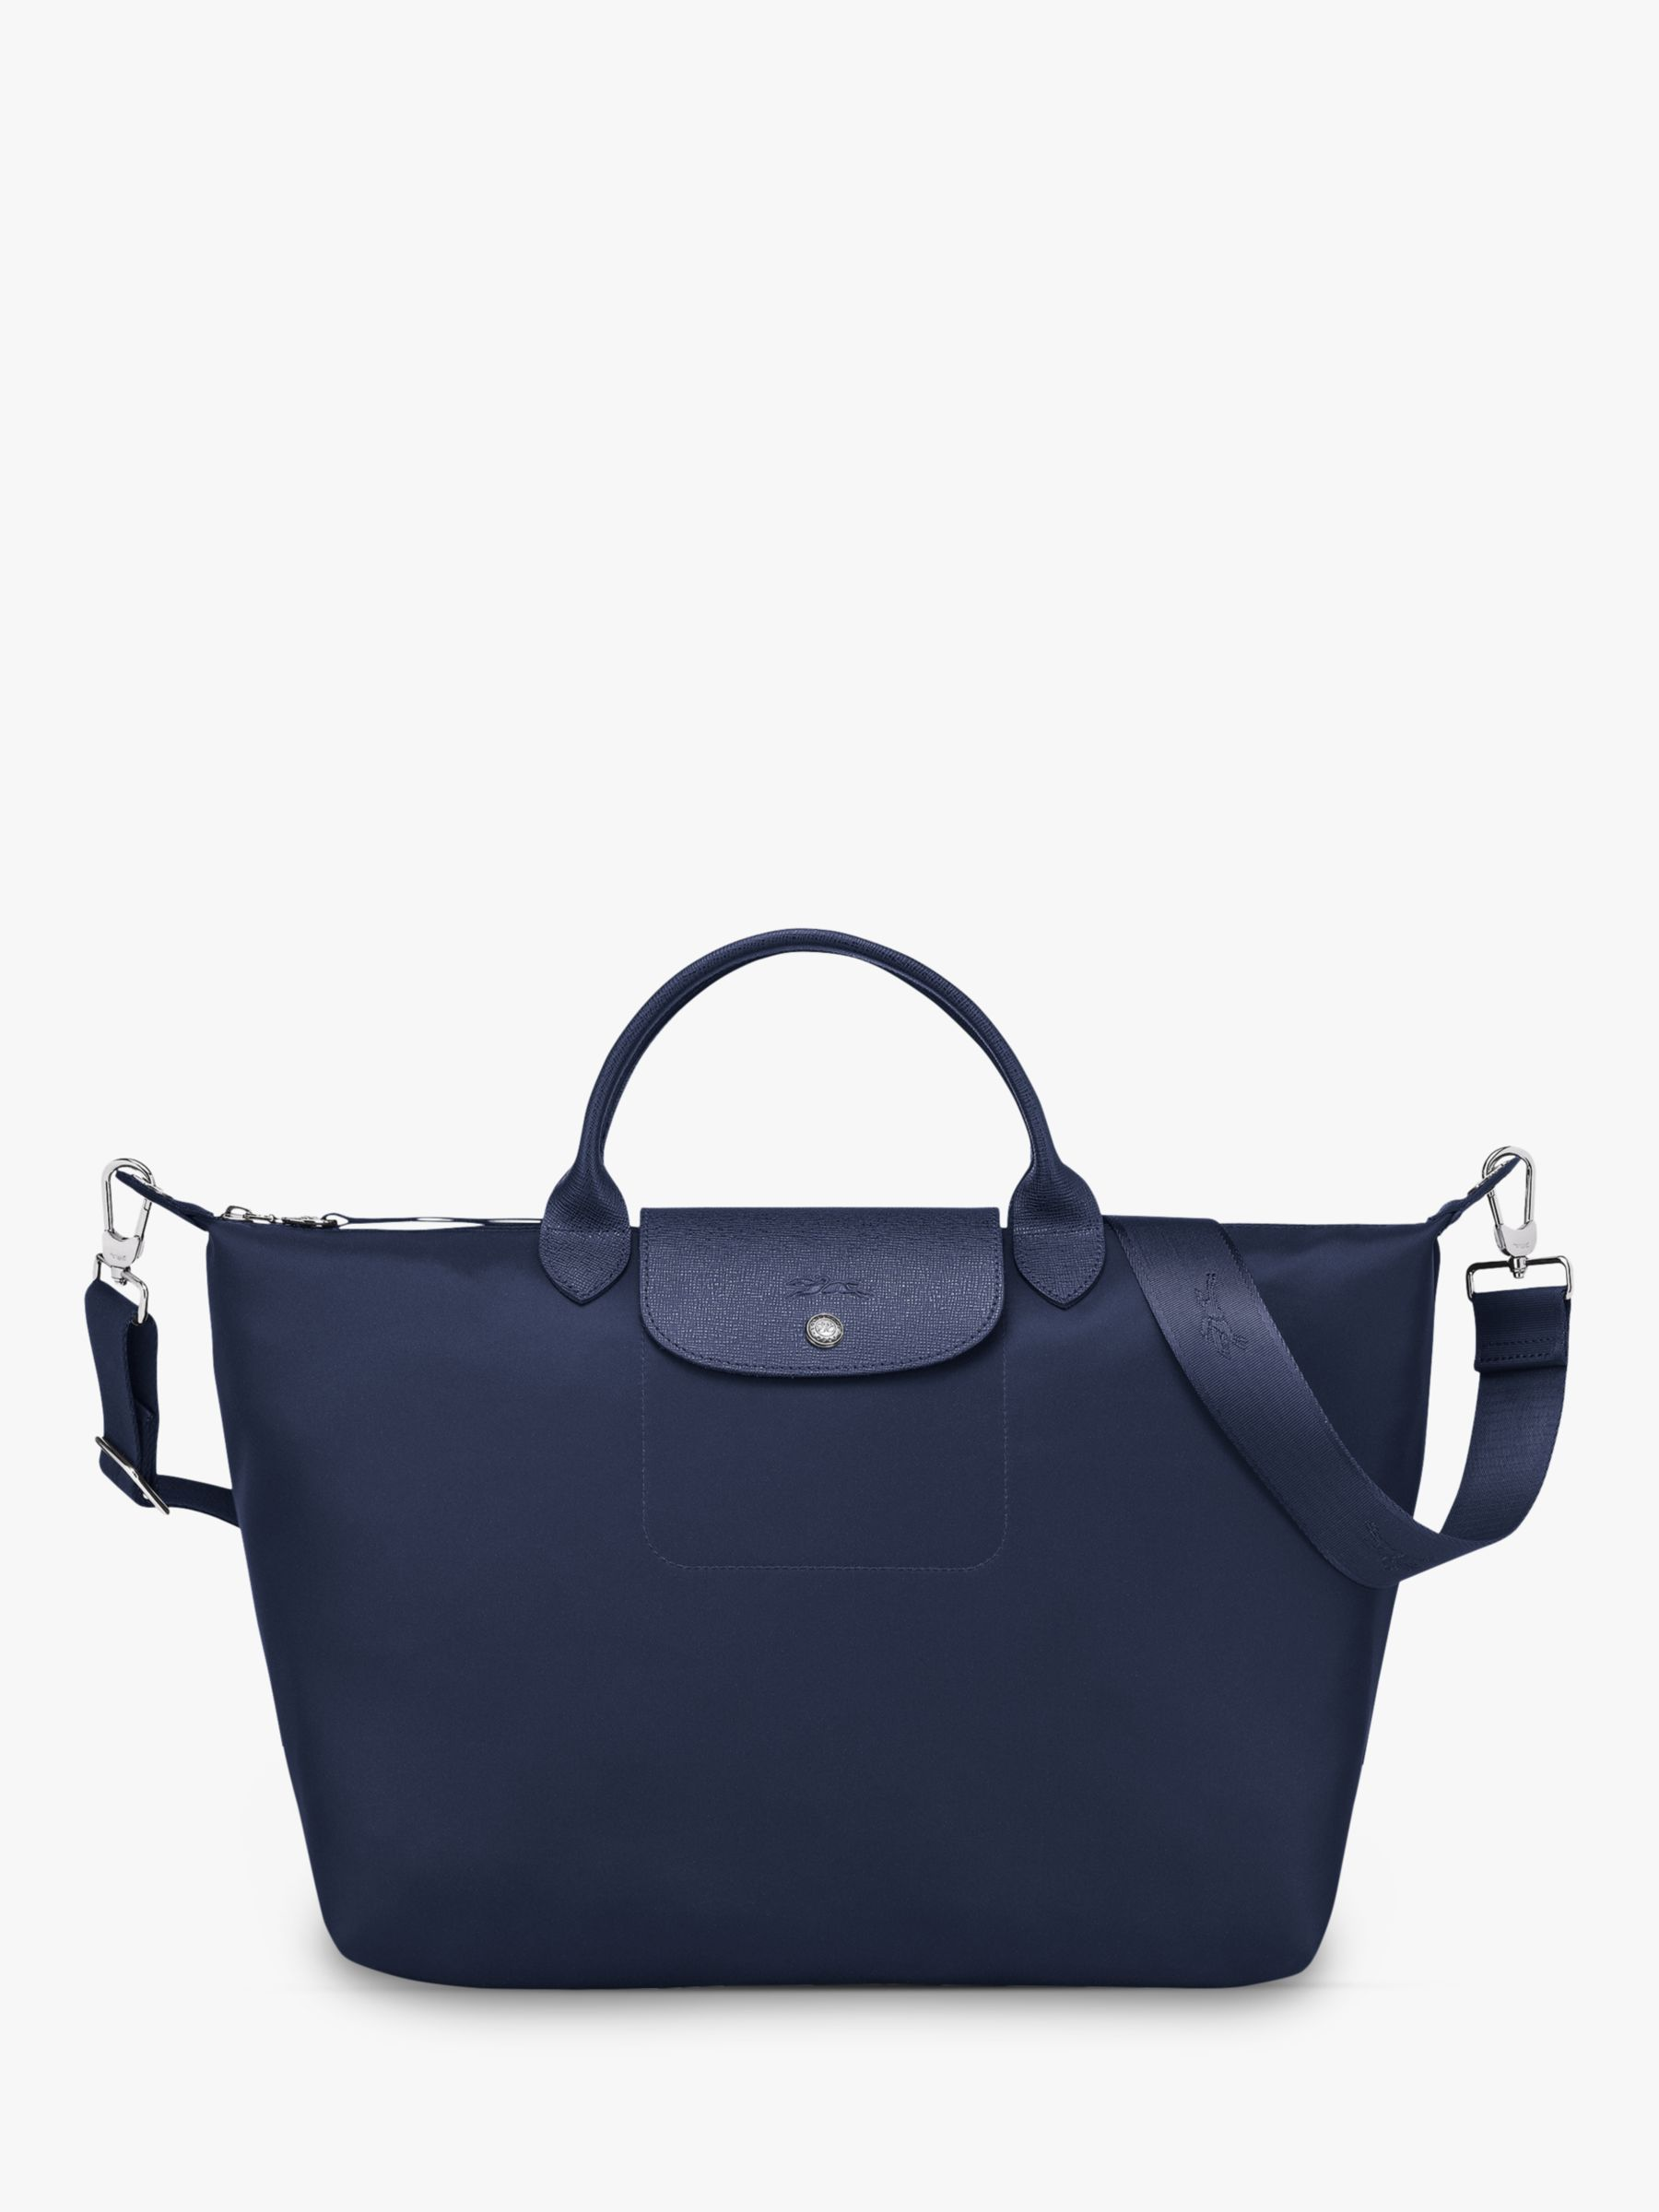 Longchamp Le Pliage Néo XL Top Handle Bag, Navy